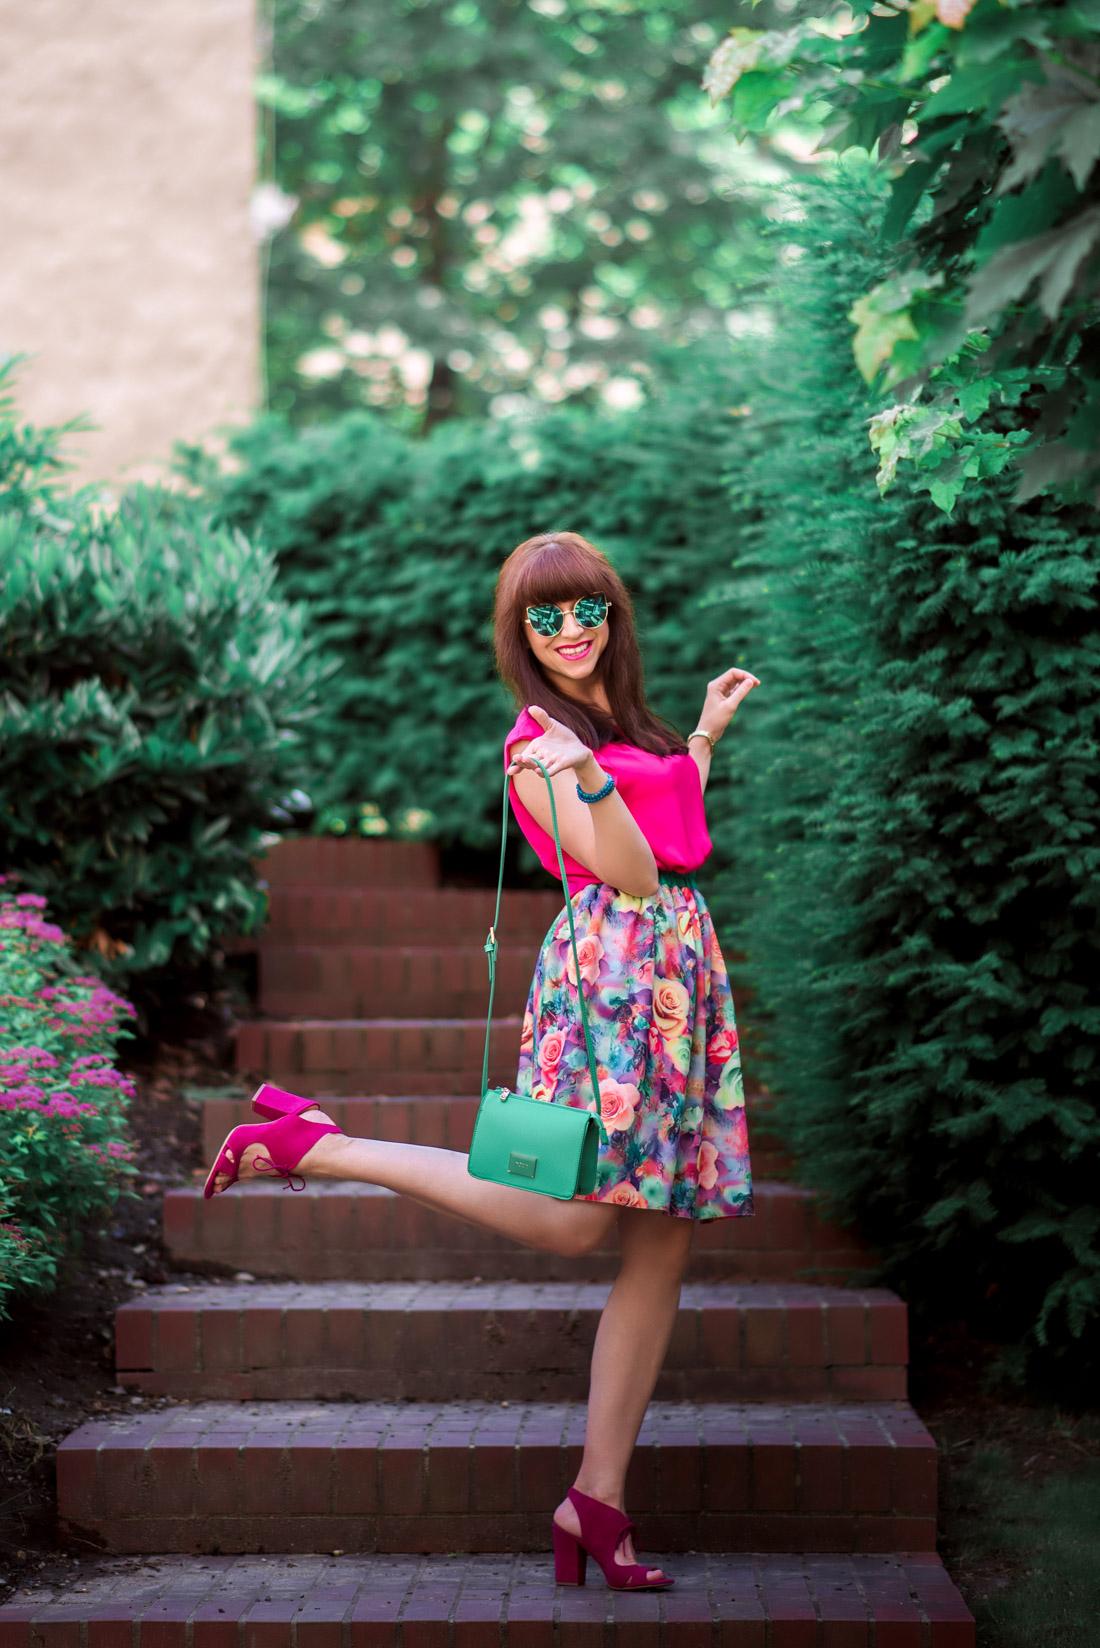 MAMA JE MAMA & KVETINOVÁ SUKŇA_Katharine-fashion is beautiful_blog 4_Kvetinová sukňa_Zelená kabelka Answear_Katarína Jakubčová_Fashion blogerka